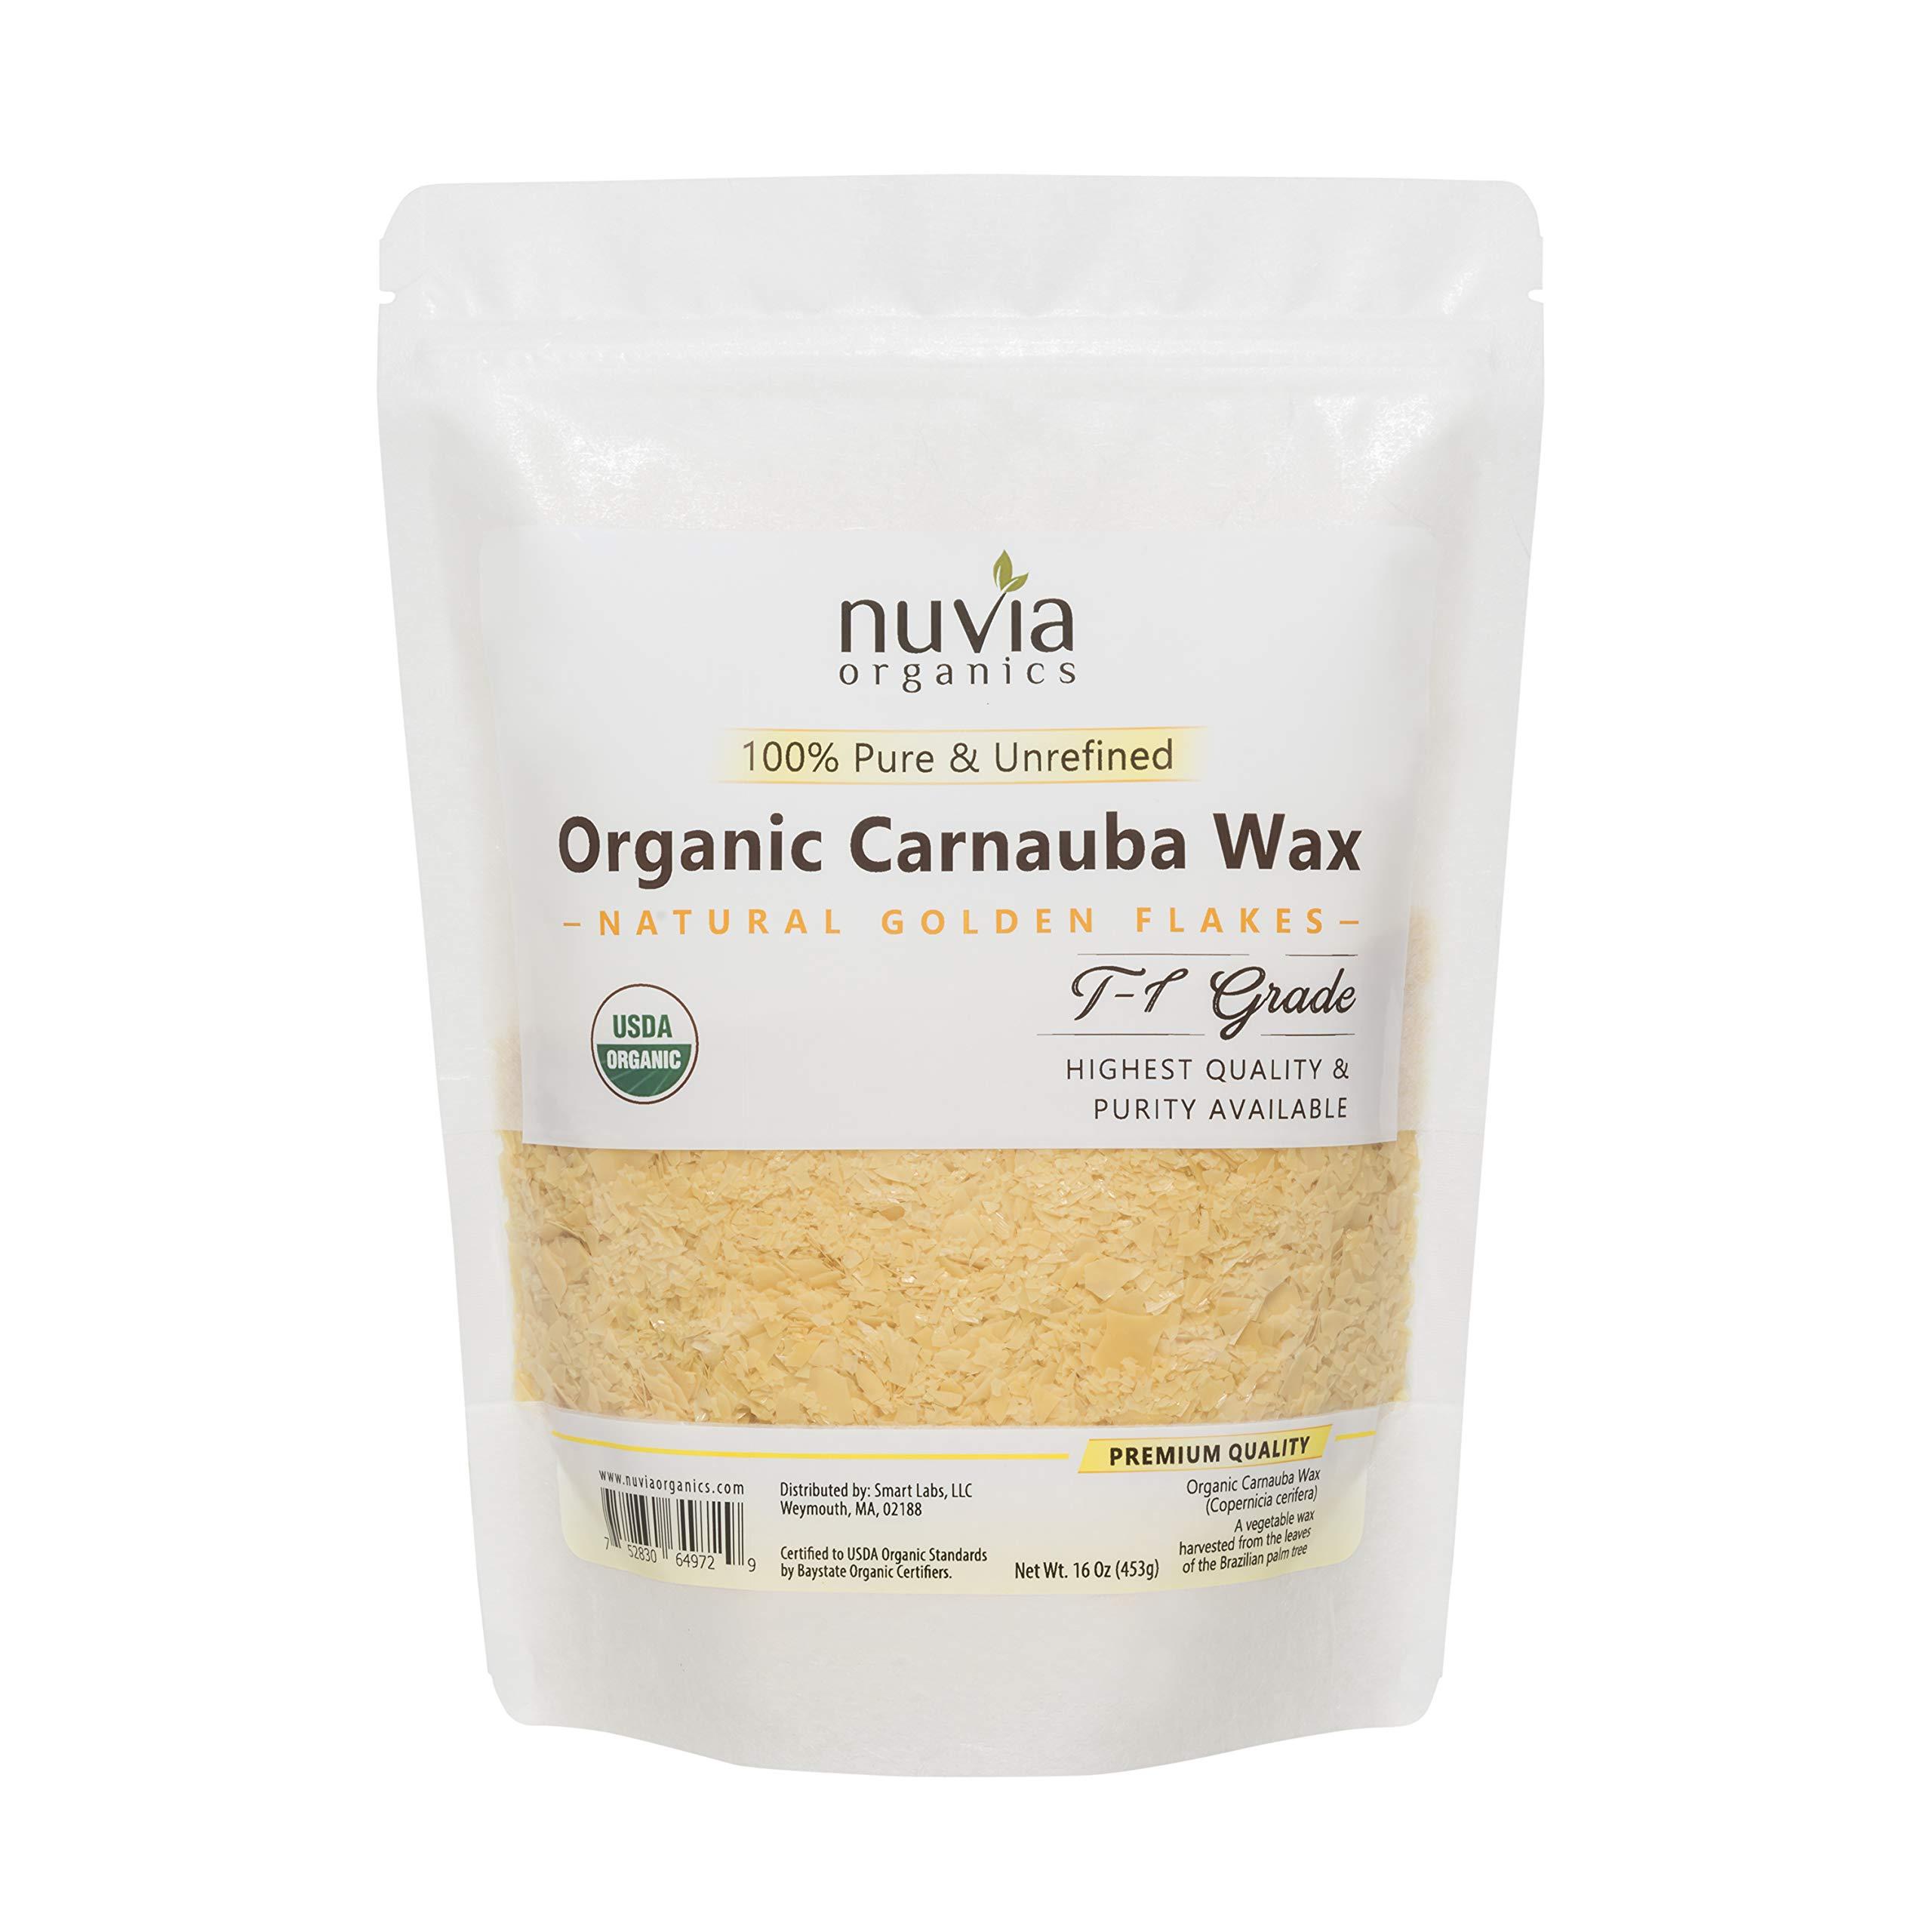 Nuvia Organics USDA Certified Carnauba Wax, 100% Vegan - Great for DIY Cosmetics, Food Grade, Various Uses, 16oz by Nuvia Organics